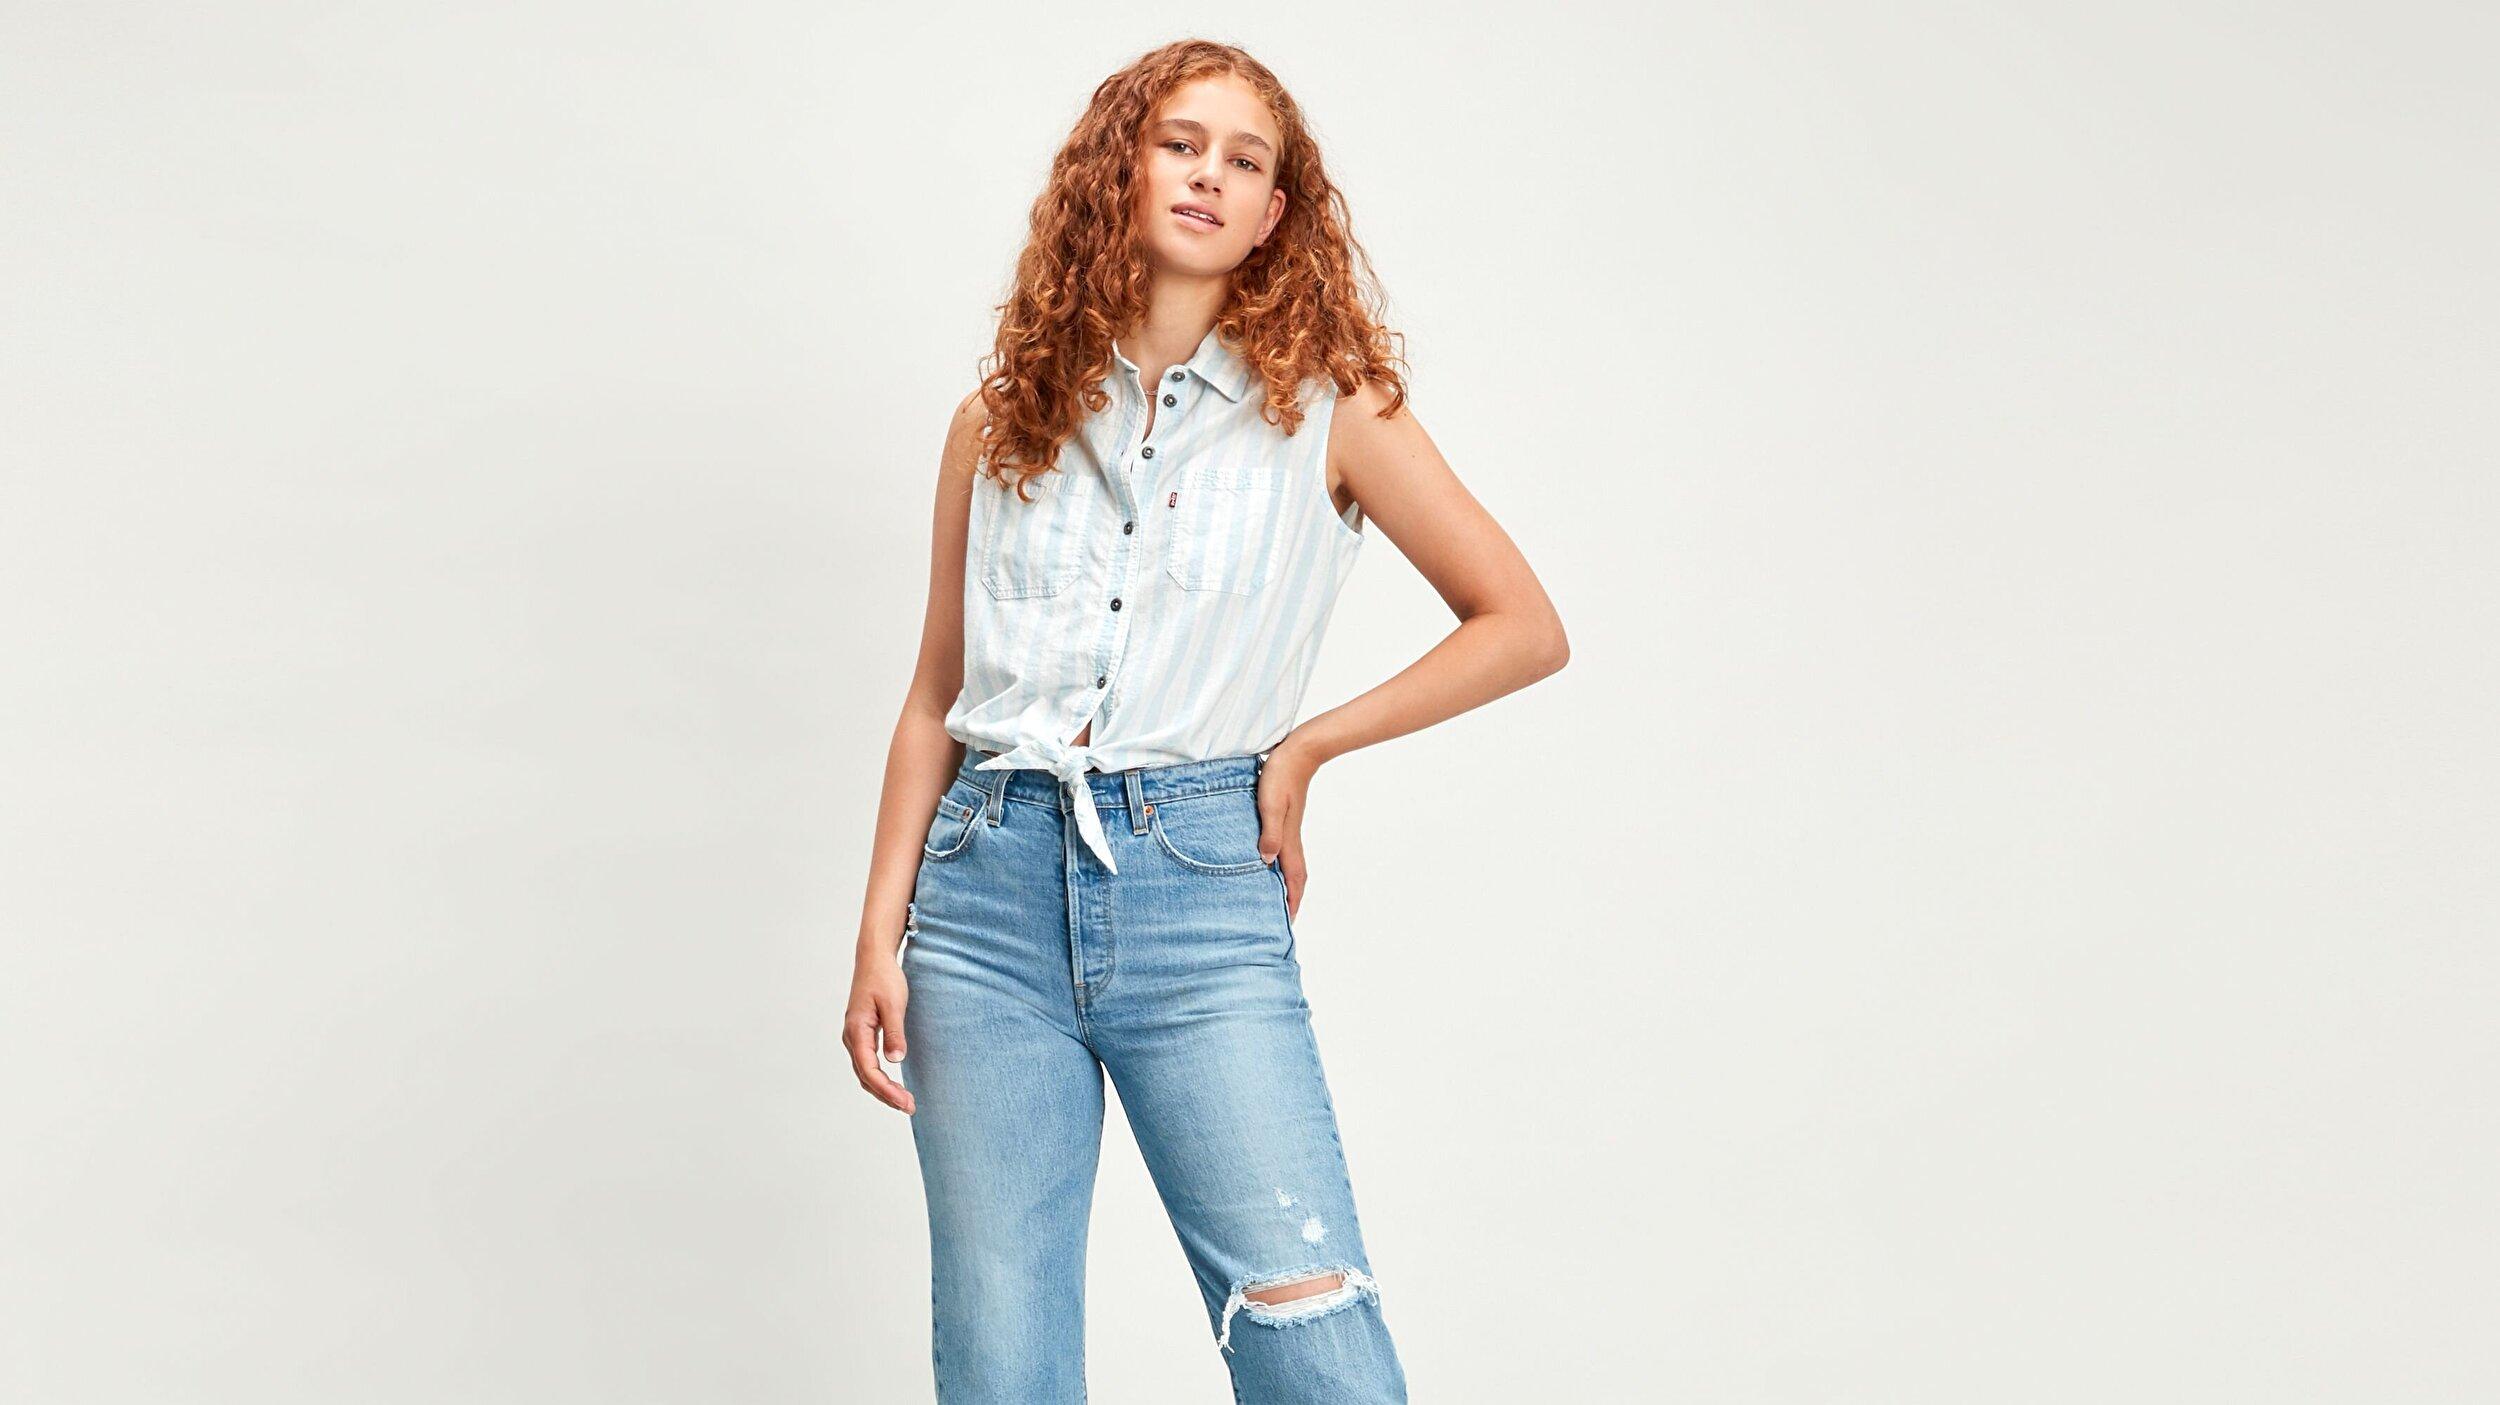 Alina Tie Shirt Amber Stripe Mavi Kadın Gömlek